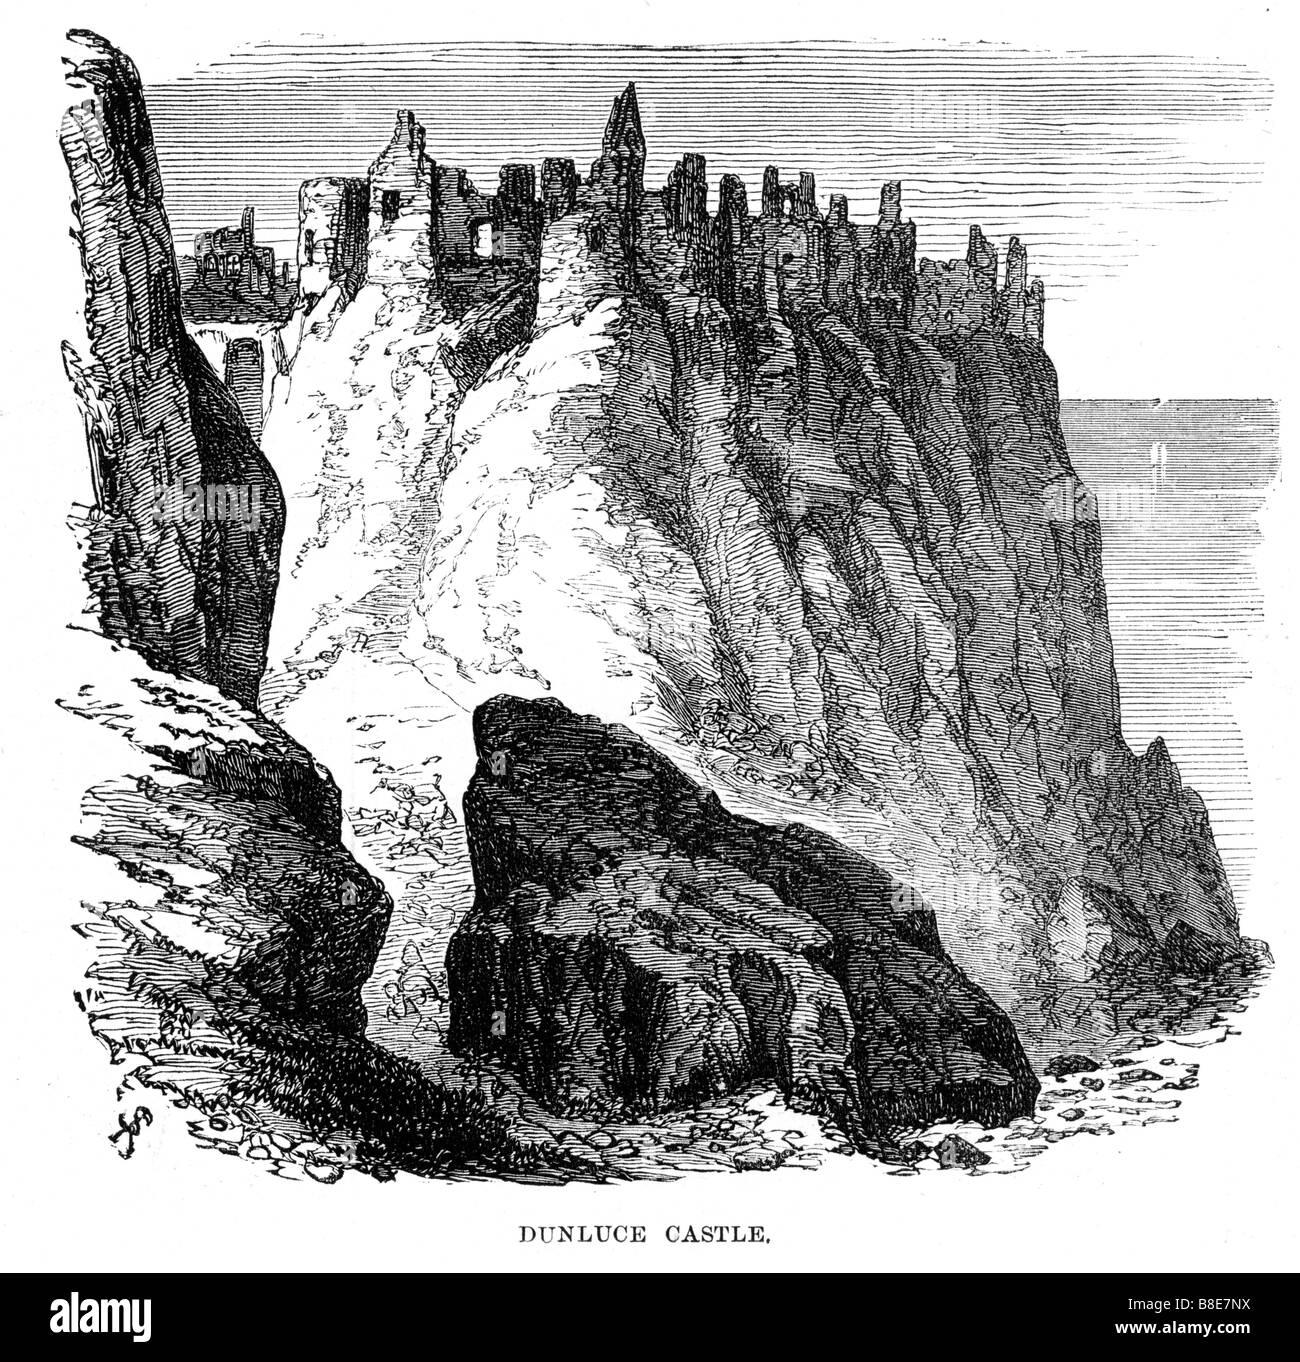 Dunluce Castle 1874 engraving of the medieval ruined castle on the Antrim basalt cliffs - Stock Image